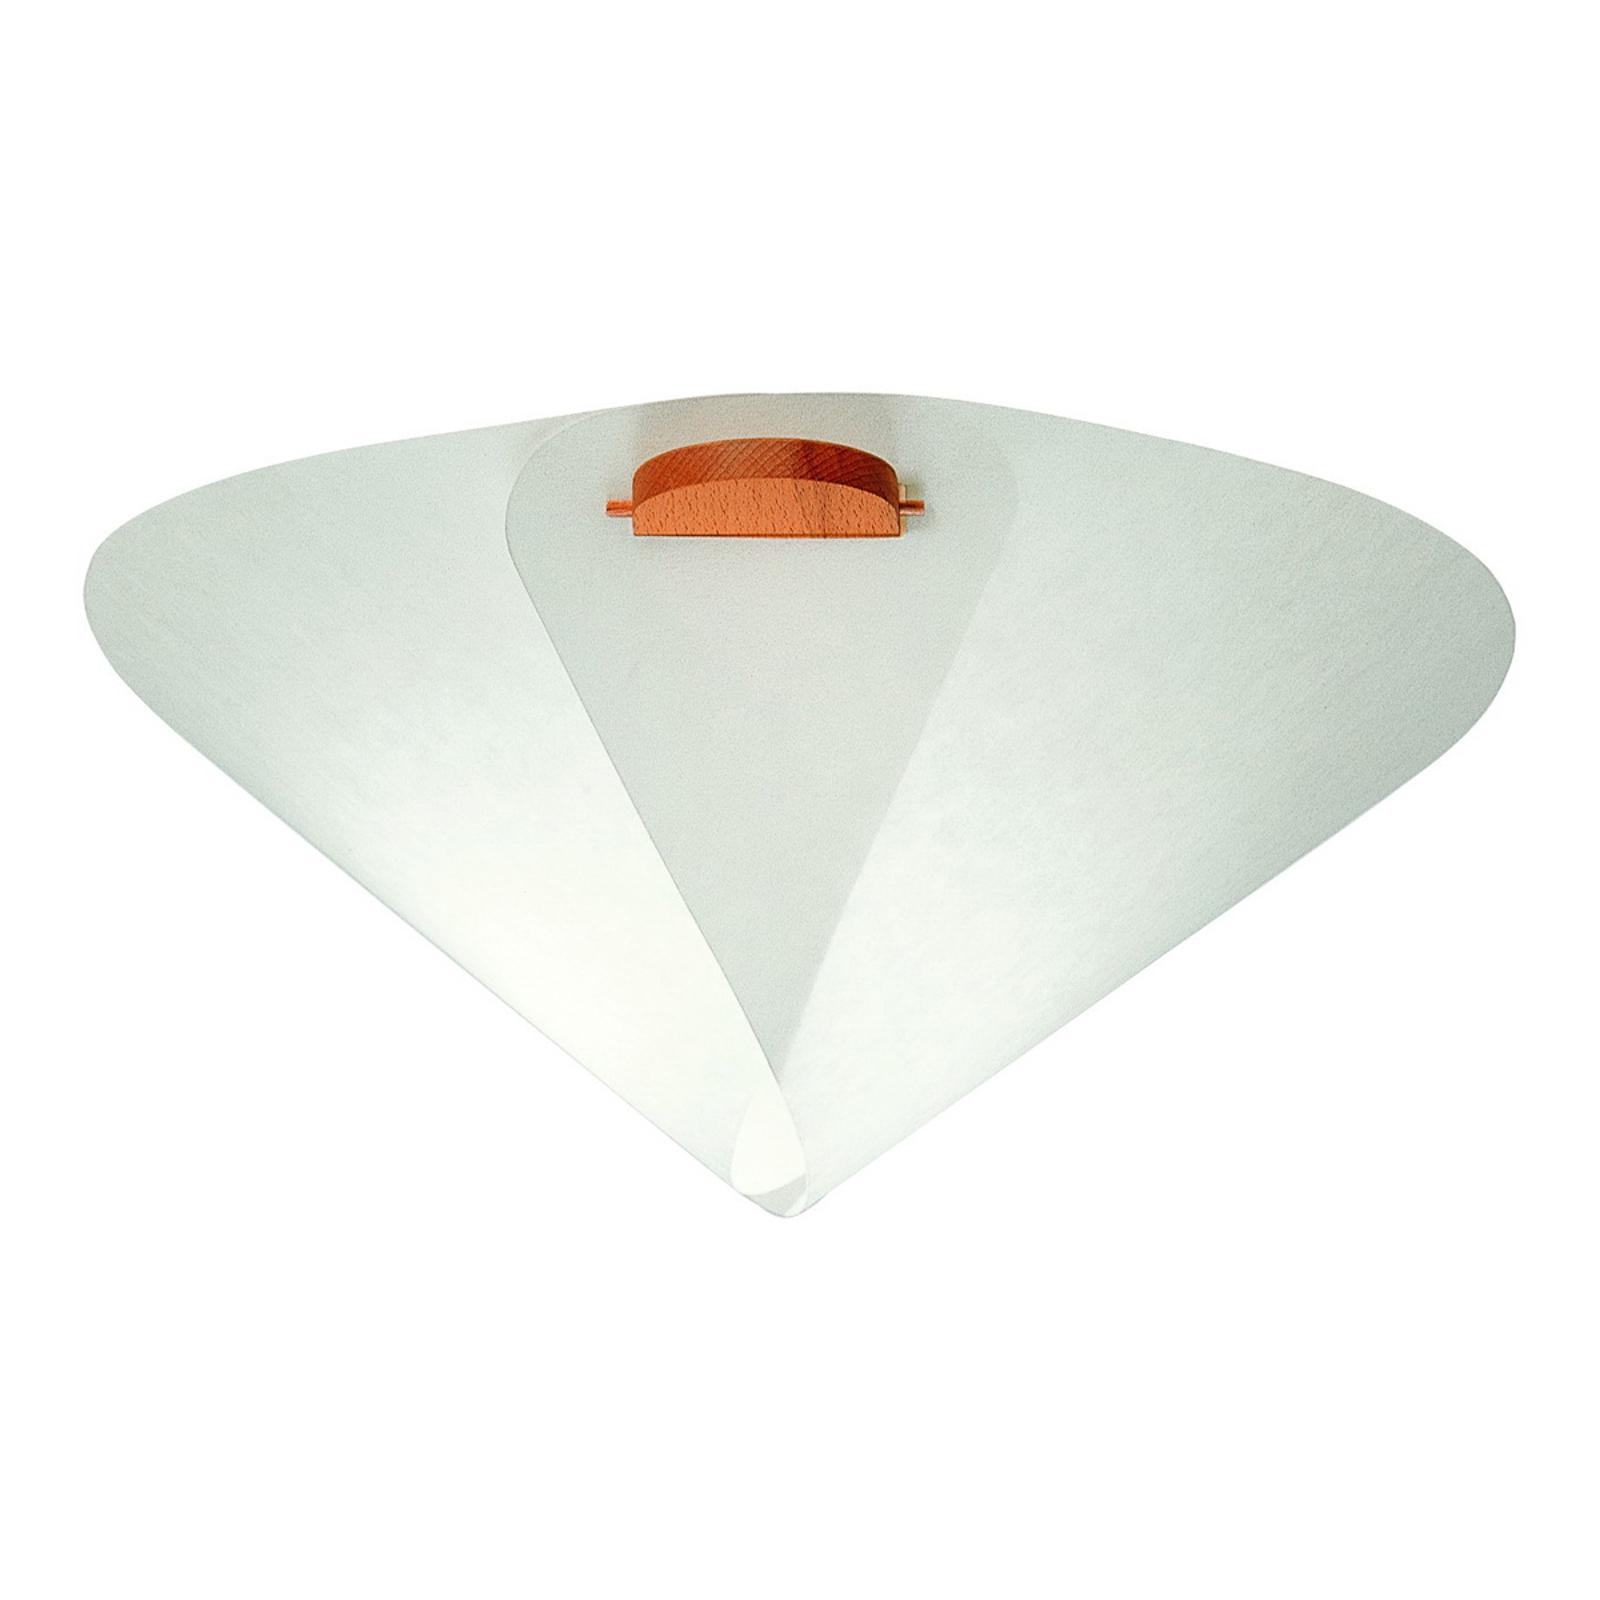 Designerska lampa sufitowa IRIS